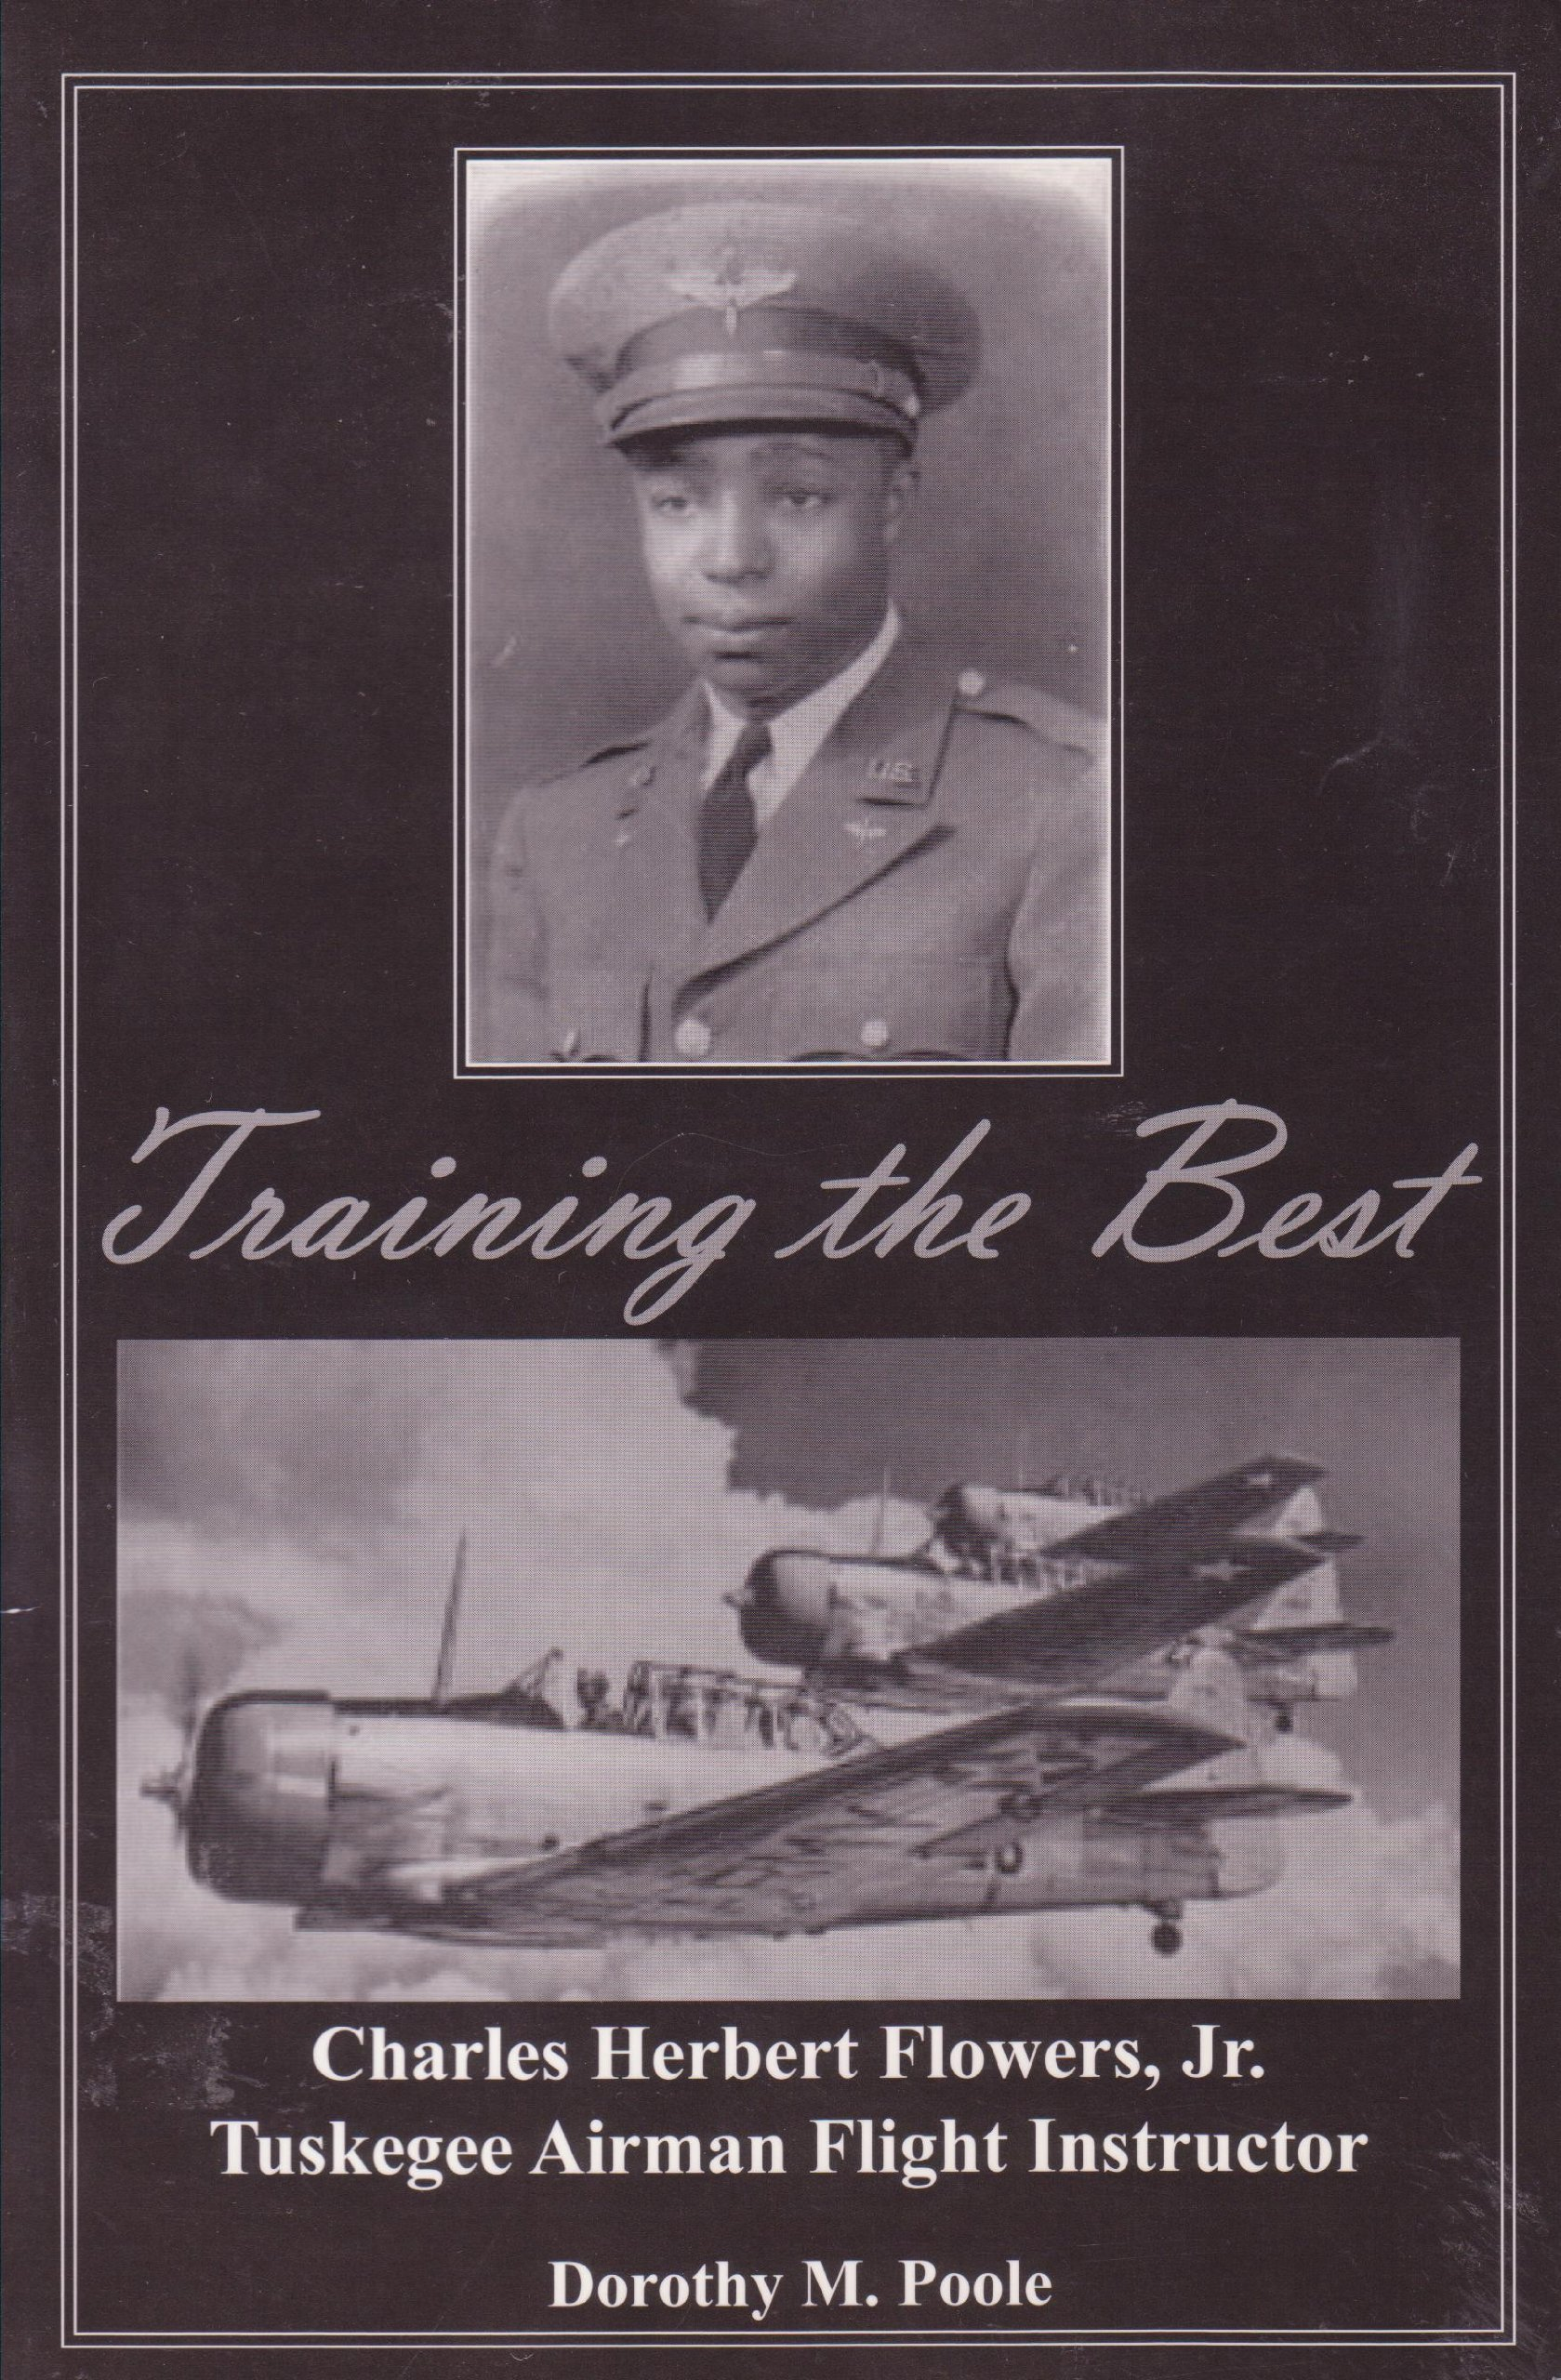 Read Online Training the Best; Charles Herbert Flowers, Jr. Tuskegee Airman Flight Instructor PDF Text fb2 book